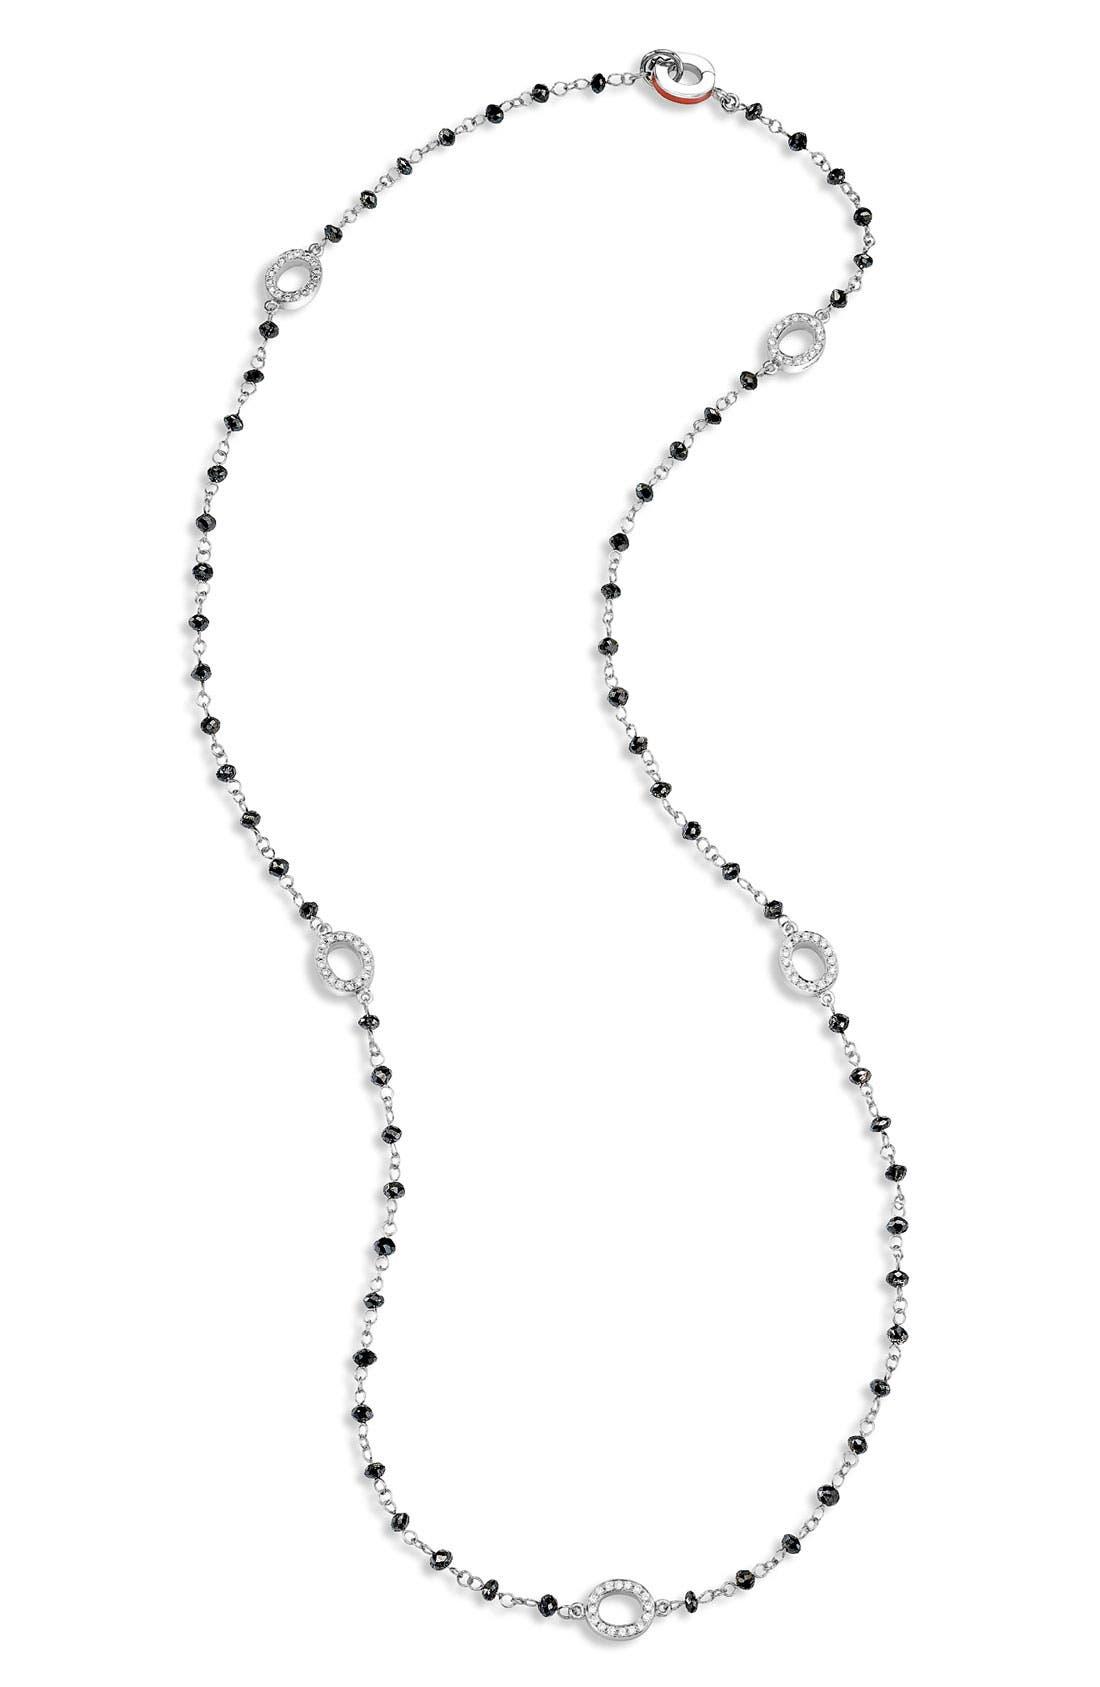 Main Image - Ivanka Trump Black Diamond Briolette Necklace